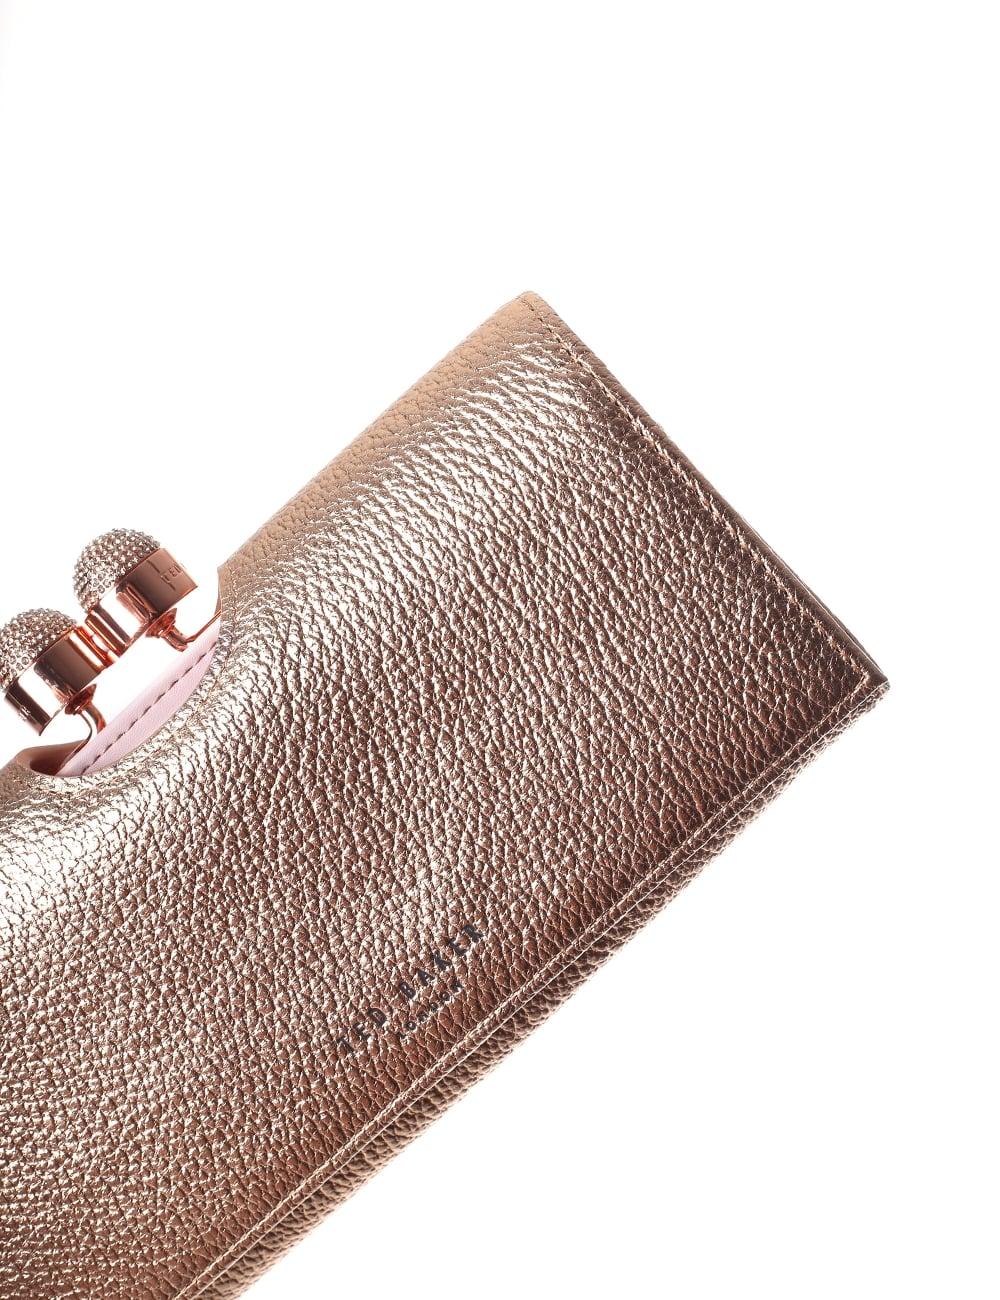 0999b85e7c3517 Ted Baker Pamelia Women s Textured Bobble Matinee